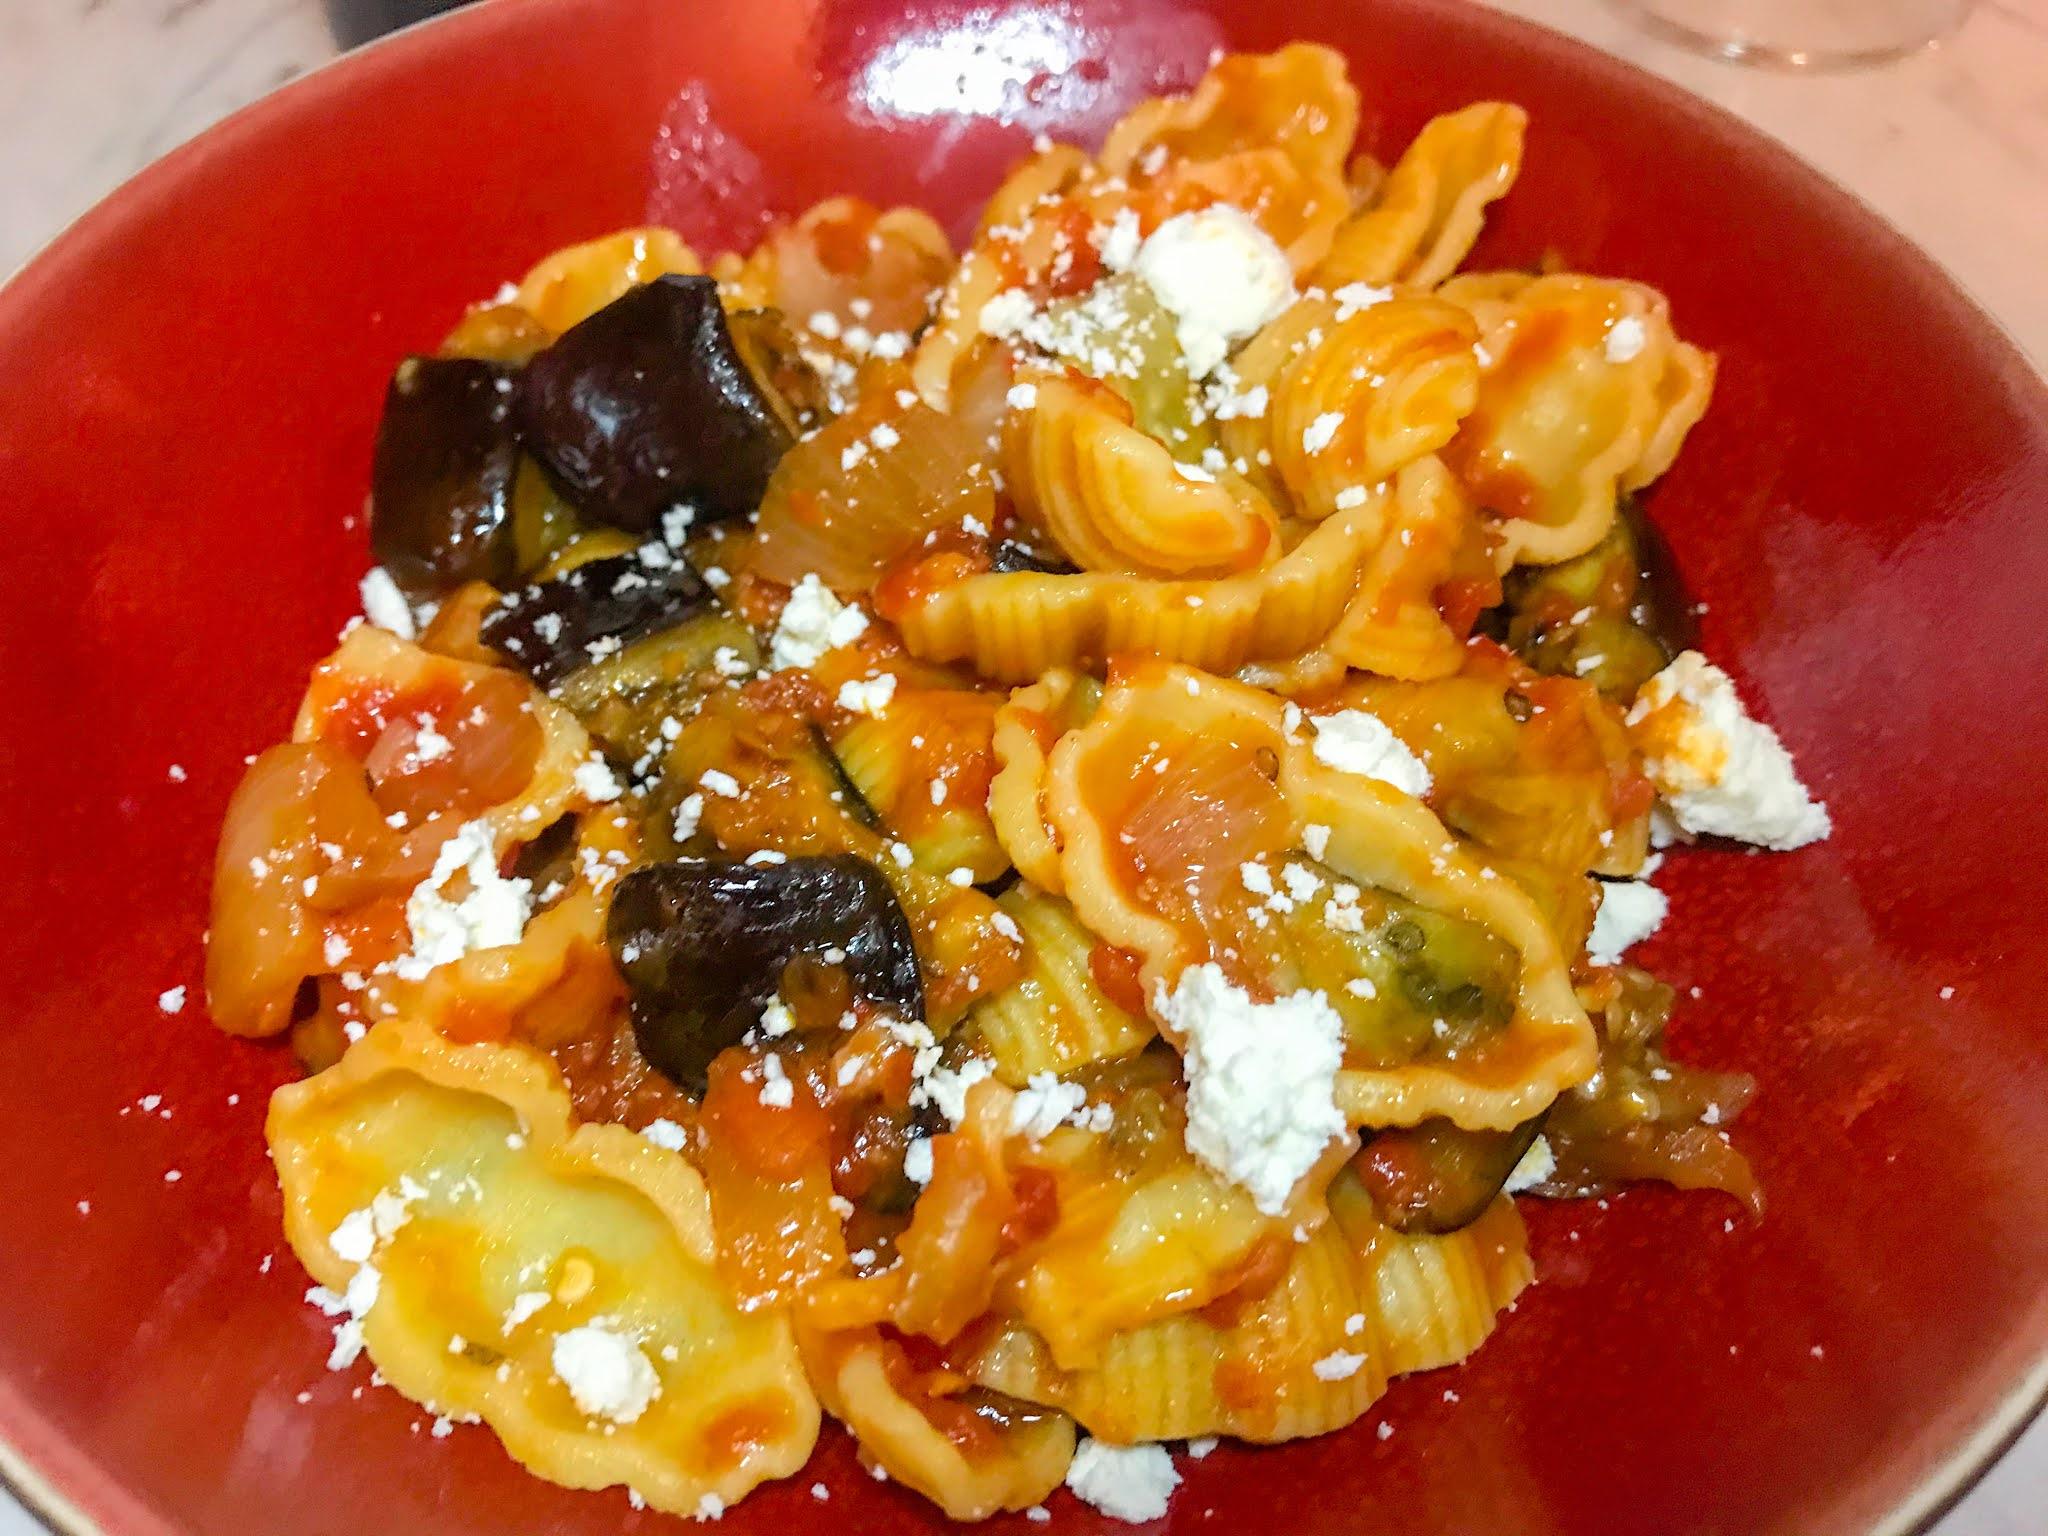 Pasta with Eggplant, Tomatoes, and 'Ndjua